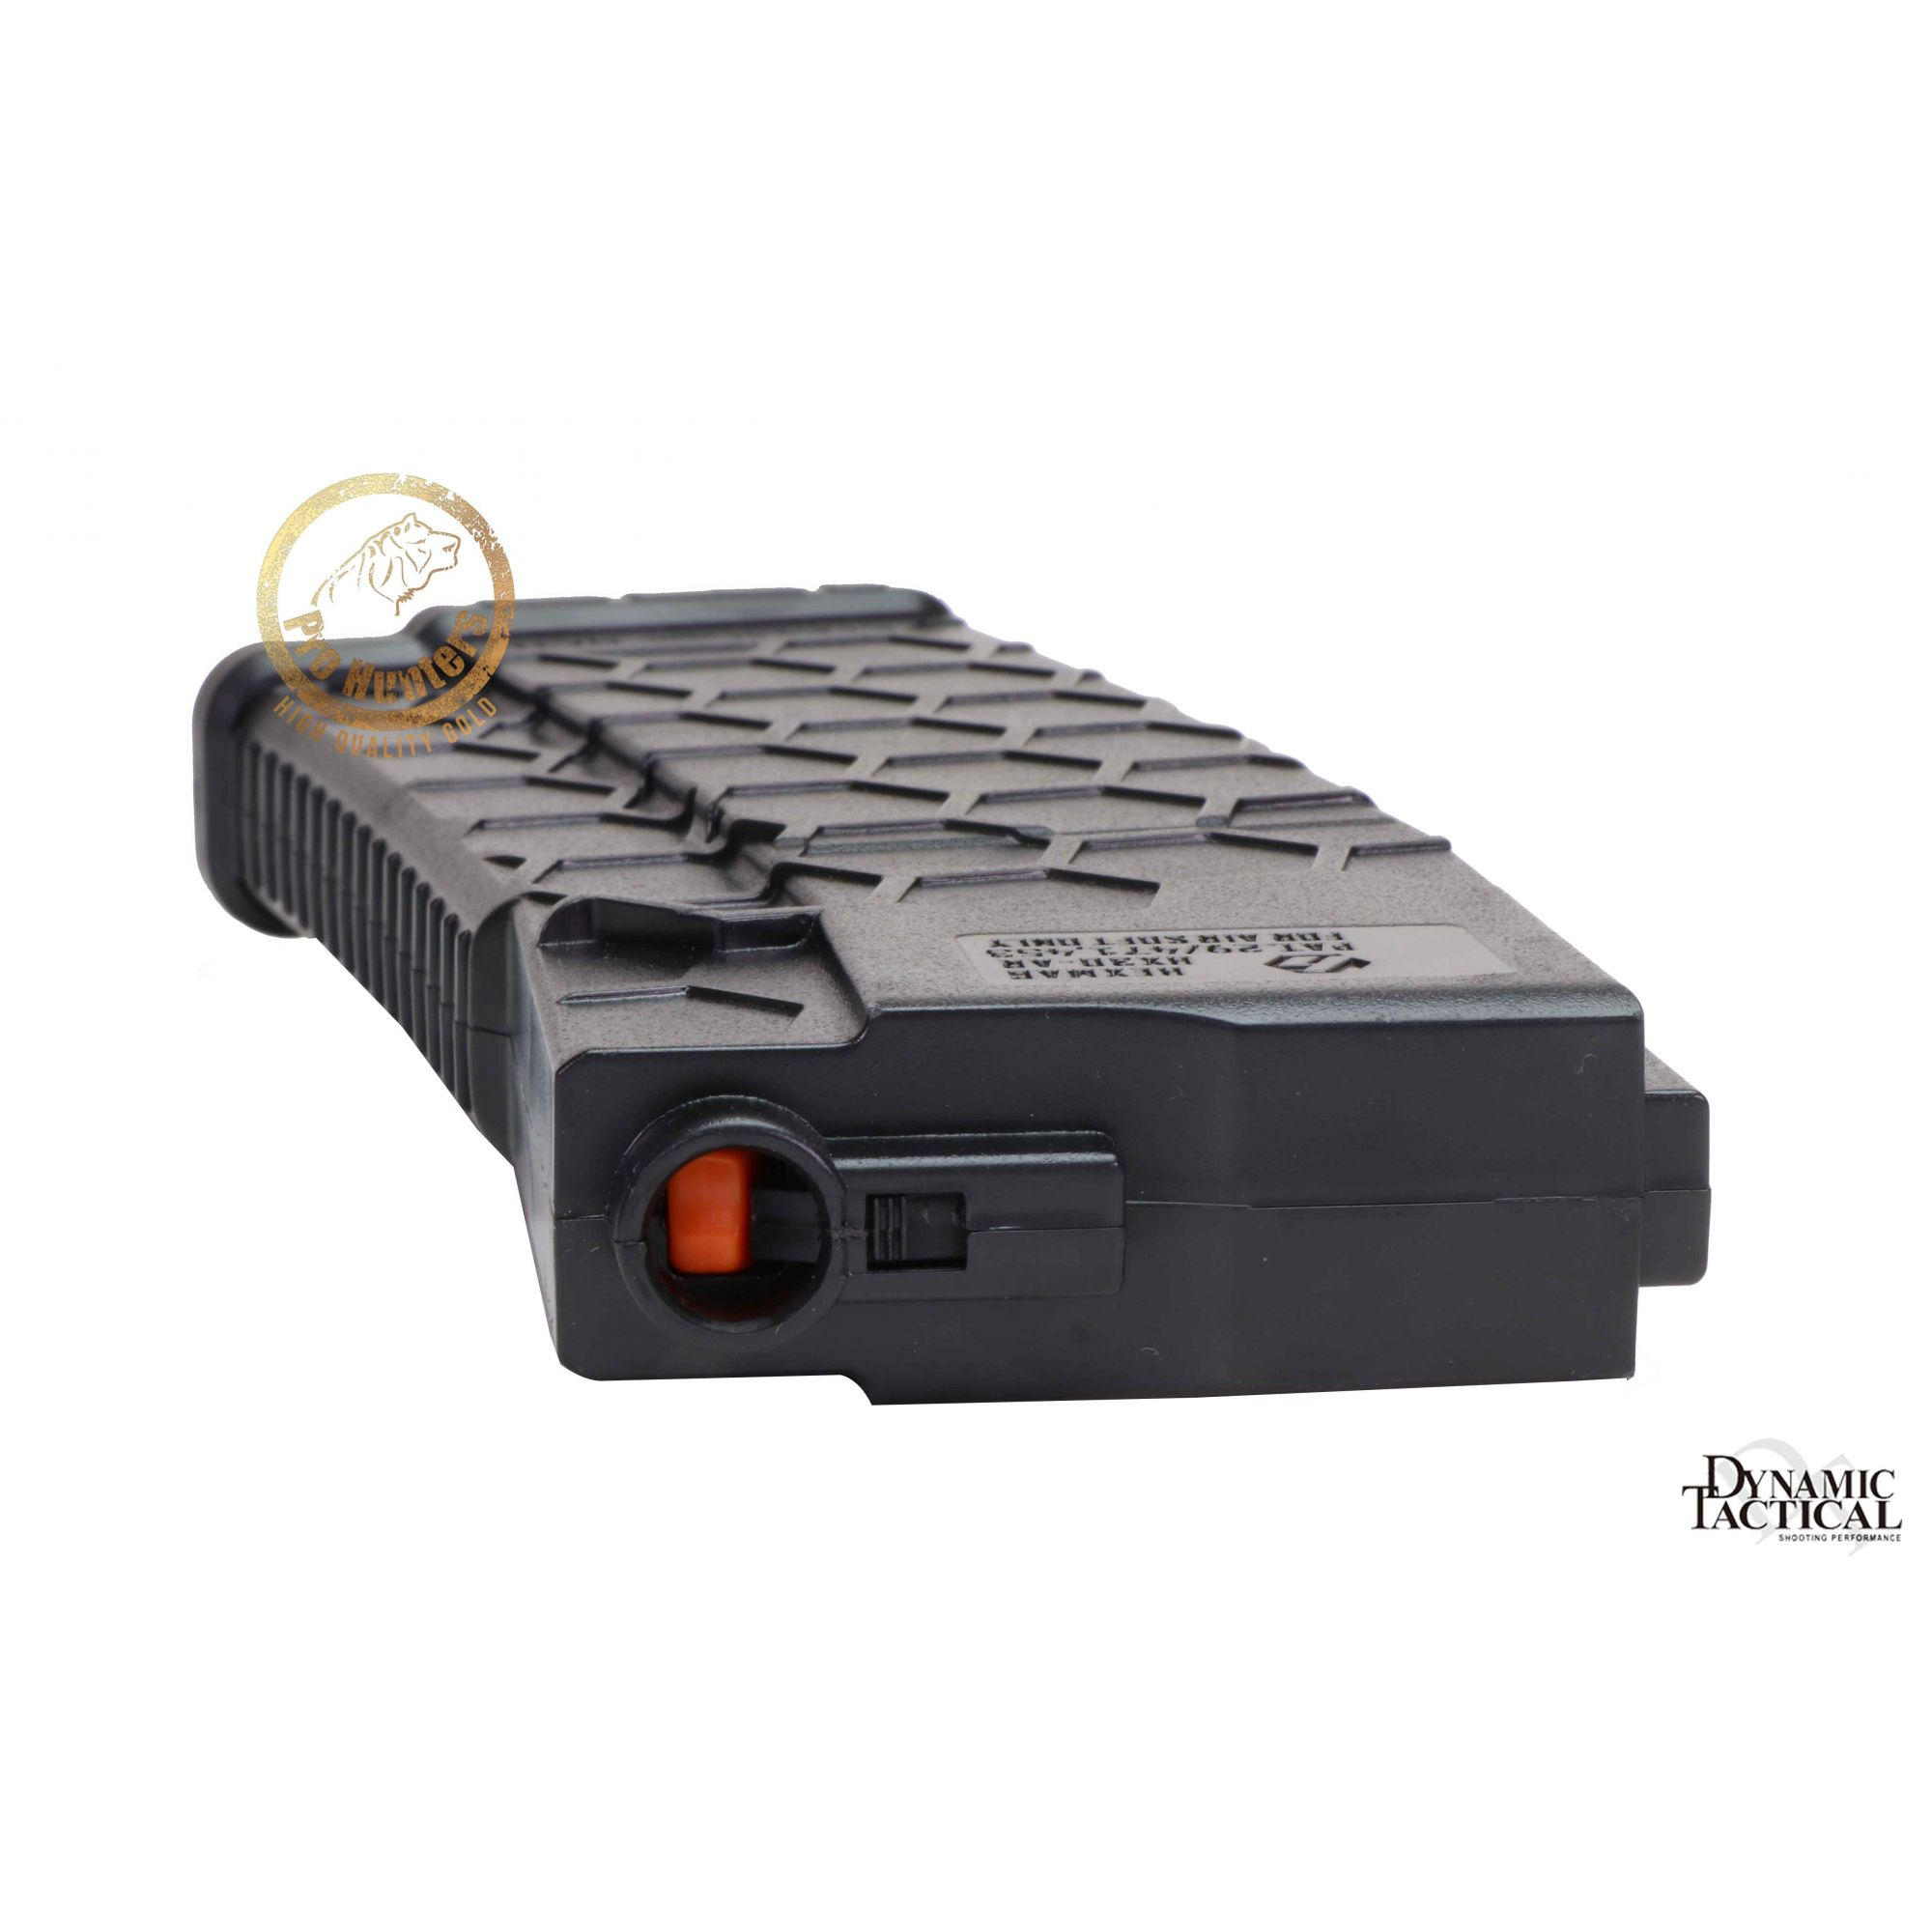 Rifle Airsoft Dytac EVO Standard M4 SBR Type A - Black - FRETE GRÁTIS